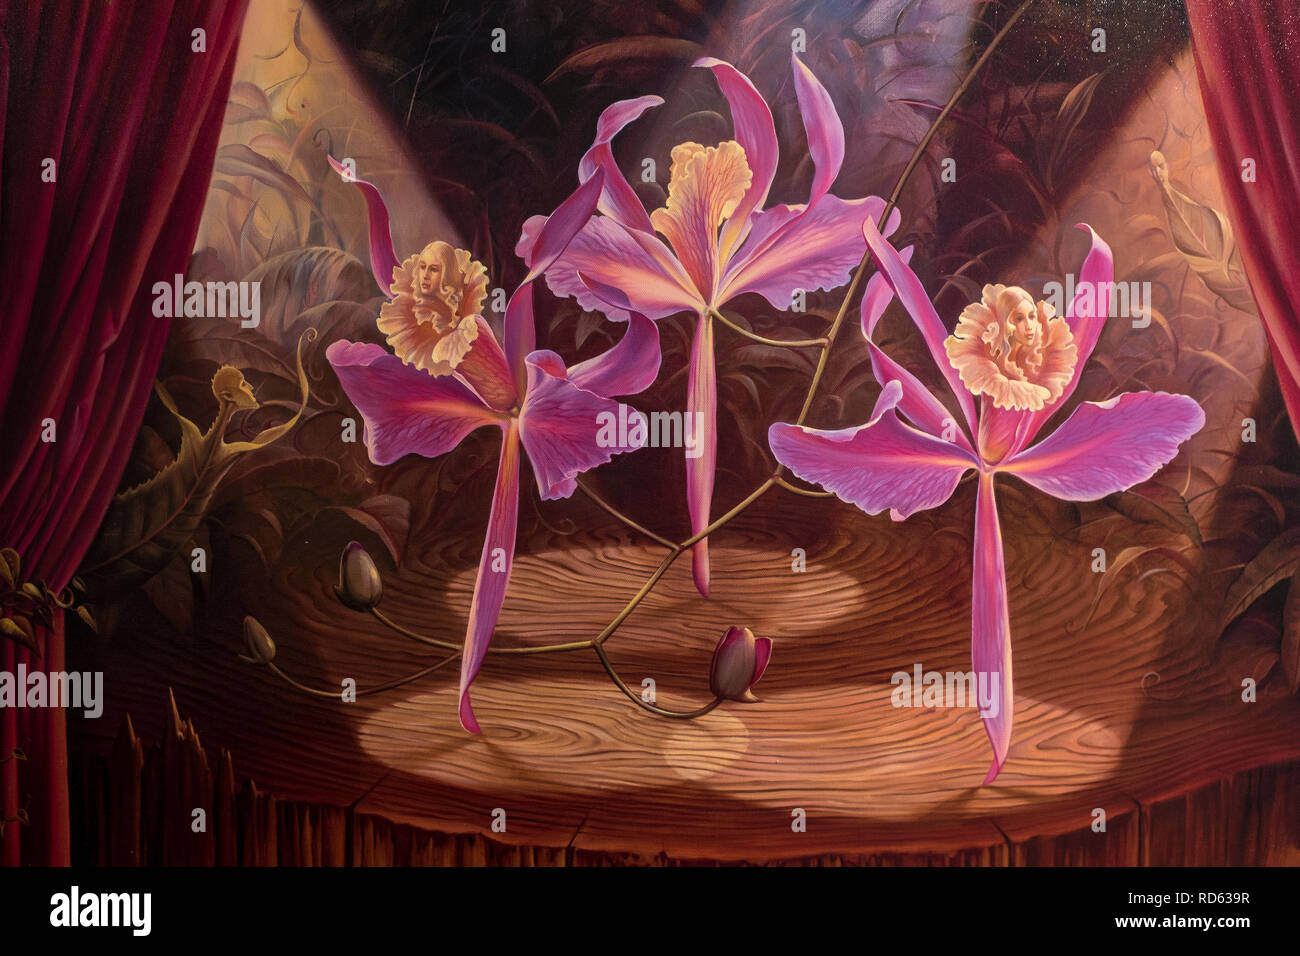 Russian born surrealist painter Vladimir Kush: (detail) 'Purple Dancers' hand signed limited edition - Stock Image